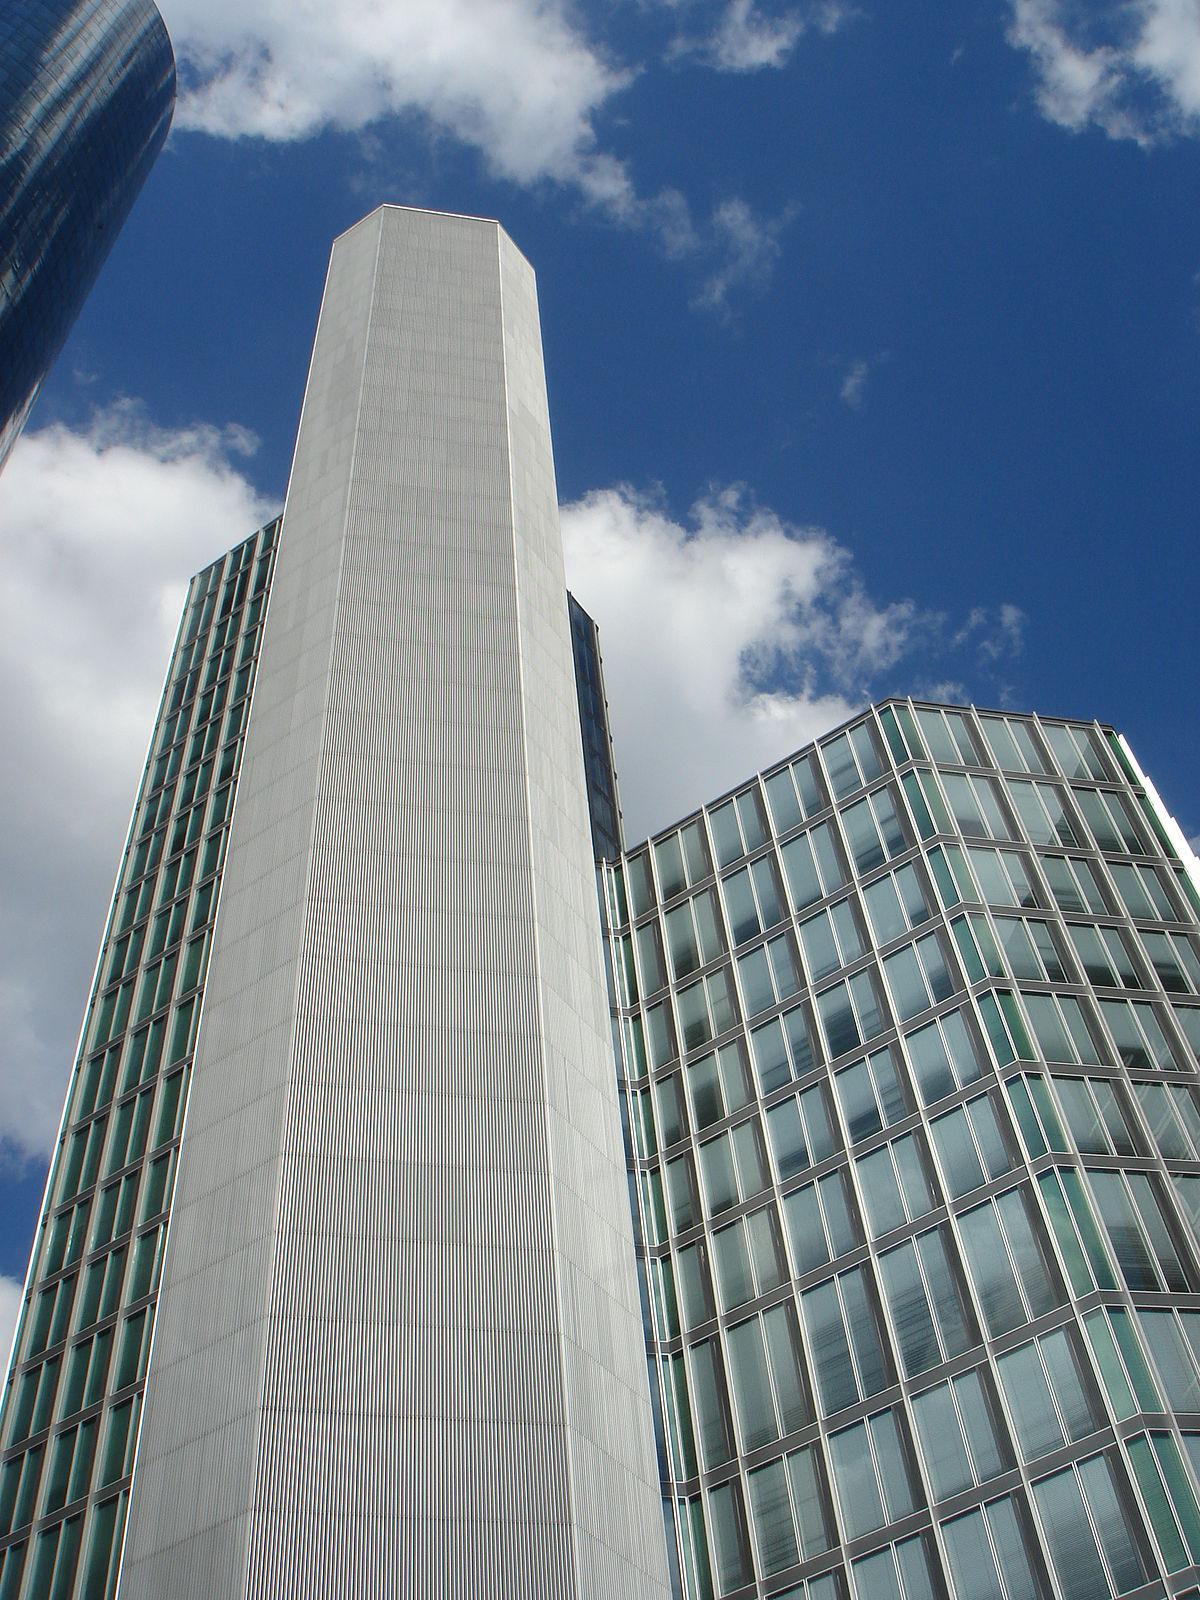 Garden Tower Wikipedia